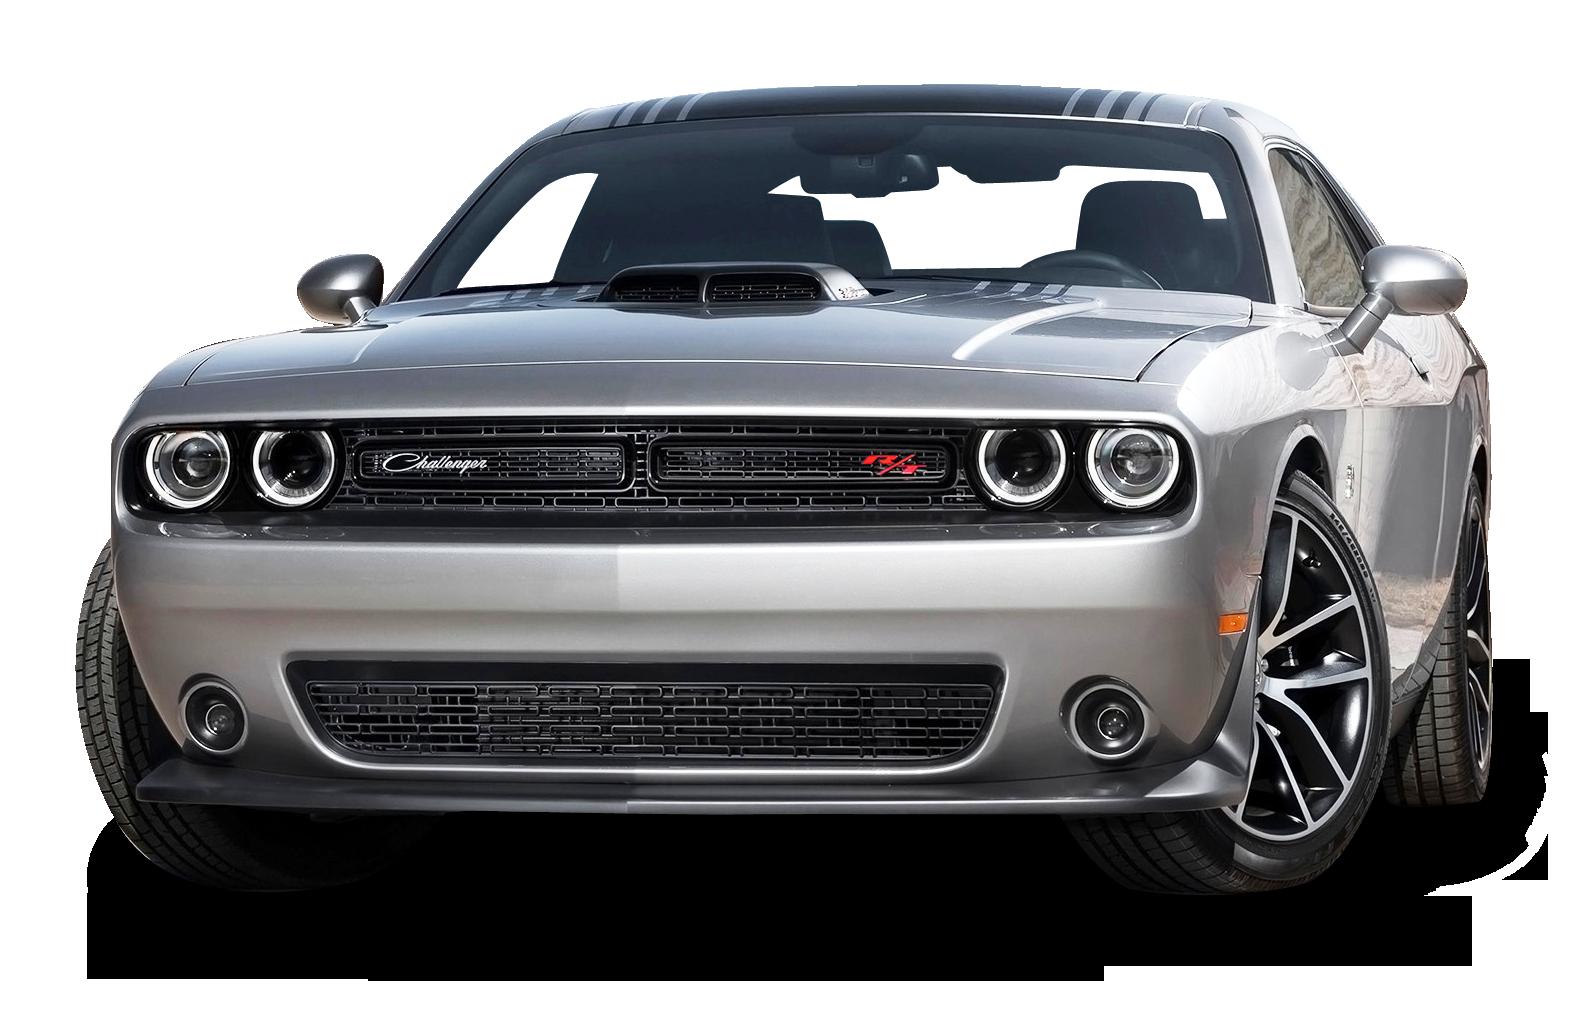 Download Gray Dodge Challenger Car Png Image For Free Dodge Challenger Car Images Challenger